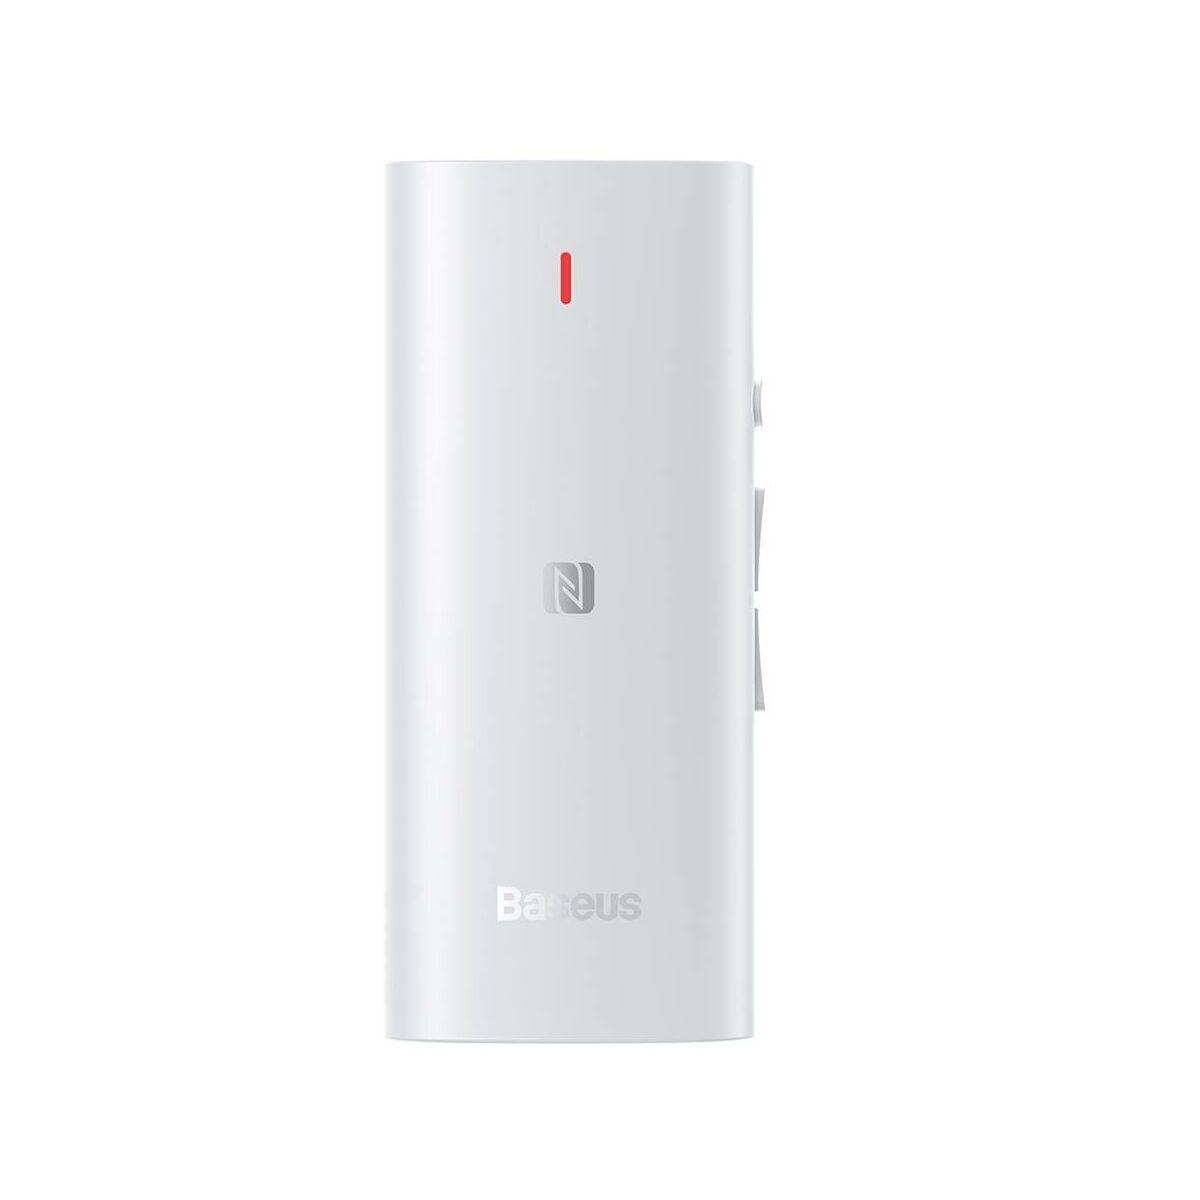 Baseus HUB, BA03 Immersive Virtual 3D Bluetooth audio adapter, fehér (NGBA03-02)